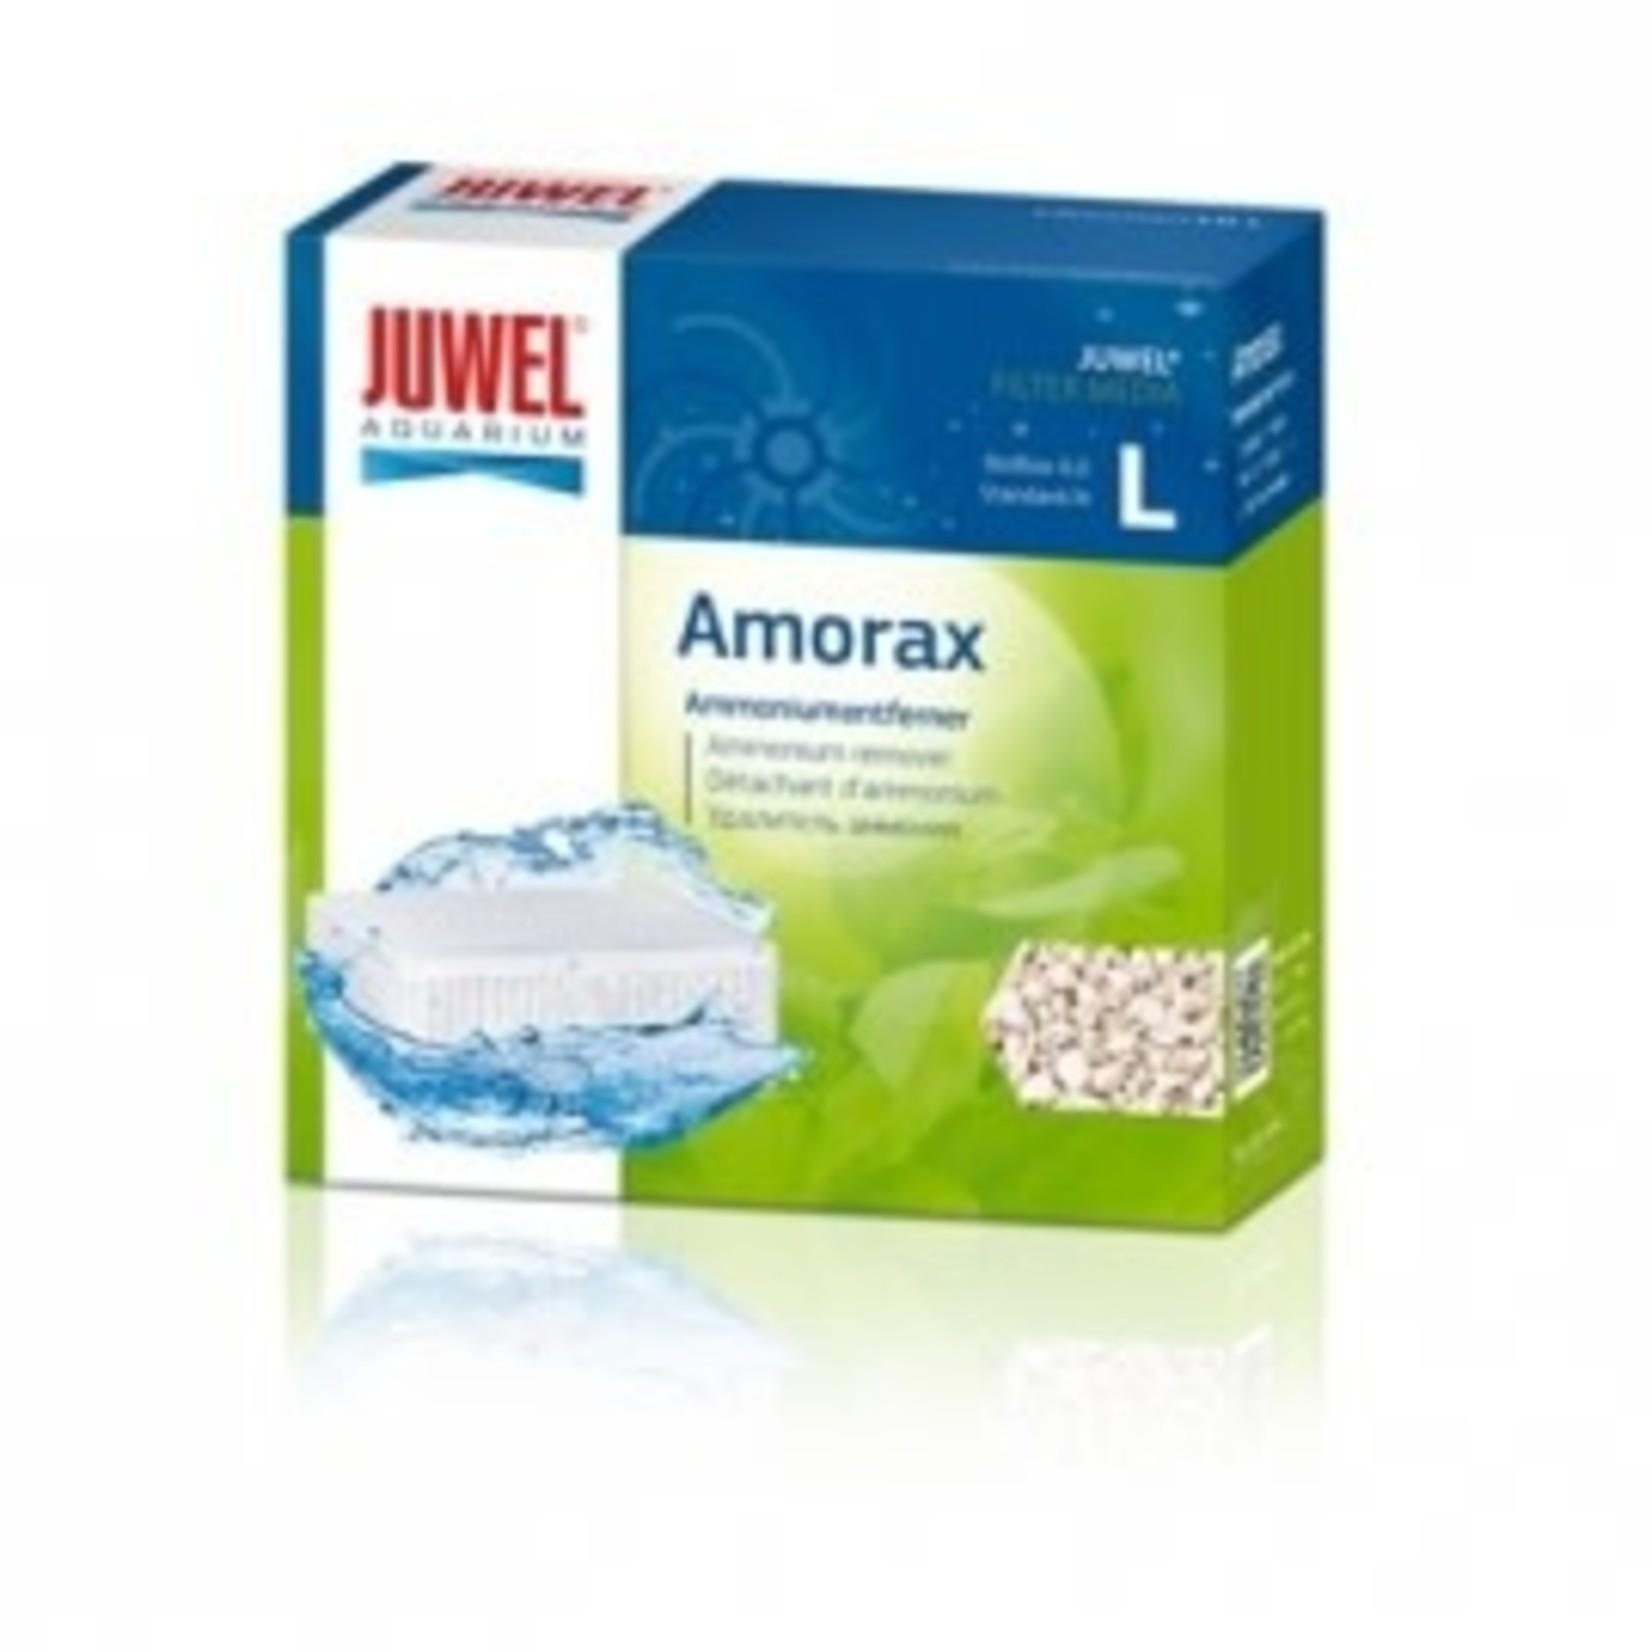 Juwel AMORAX Juwel